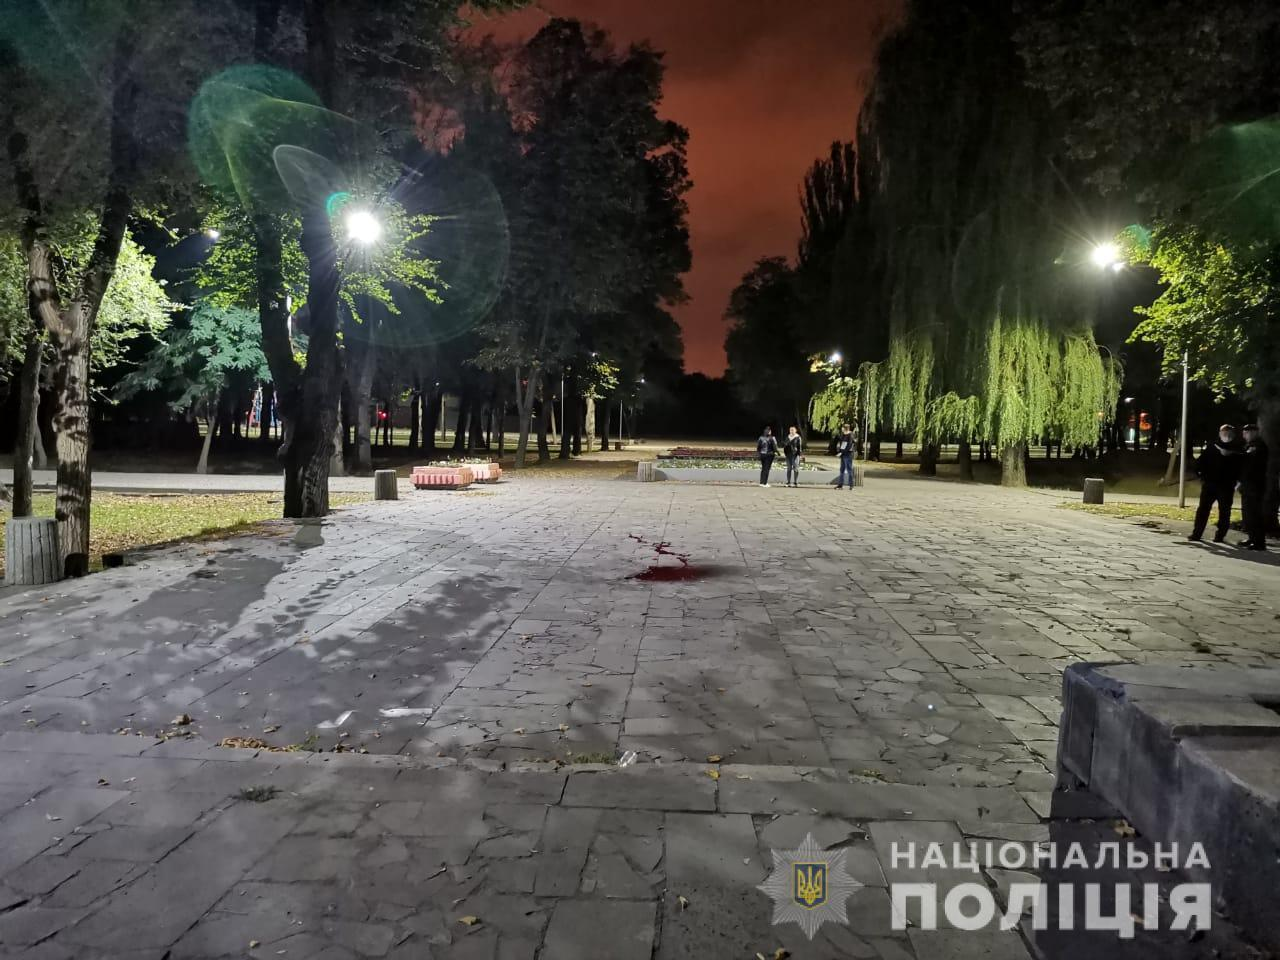 В Кривом Роге в парке мужчина до смерти избил знакомого